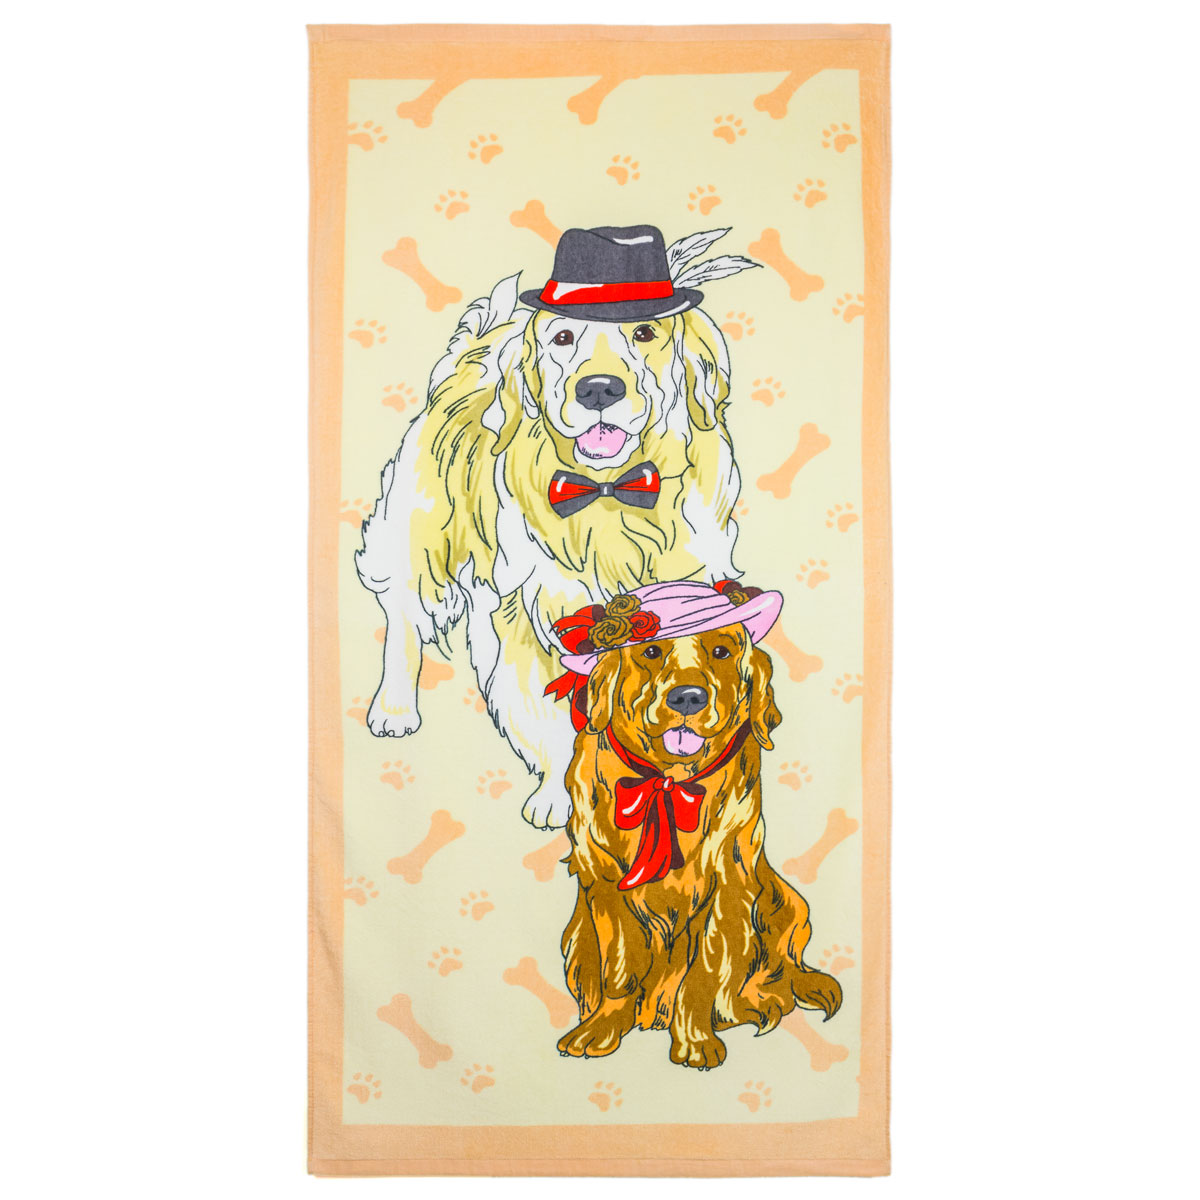 Полотенце С собаками Голубой р. 65х135Махровые полотенца<br>Плотность ткани: 330 г/кв. м<br><br>Тип: Полотенце<br>Размер: 65х135<br>Материал: Махра